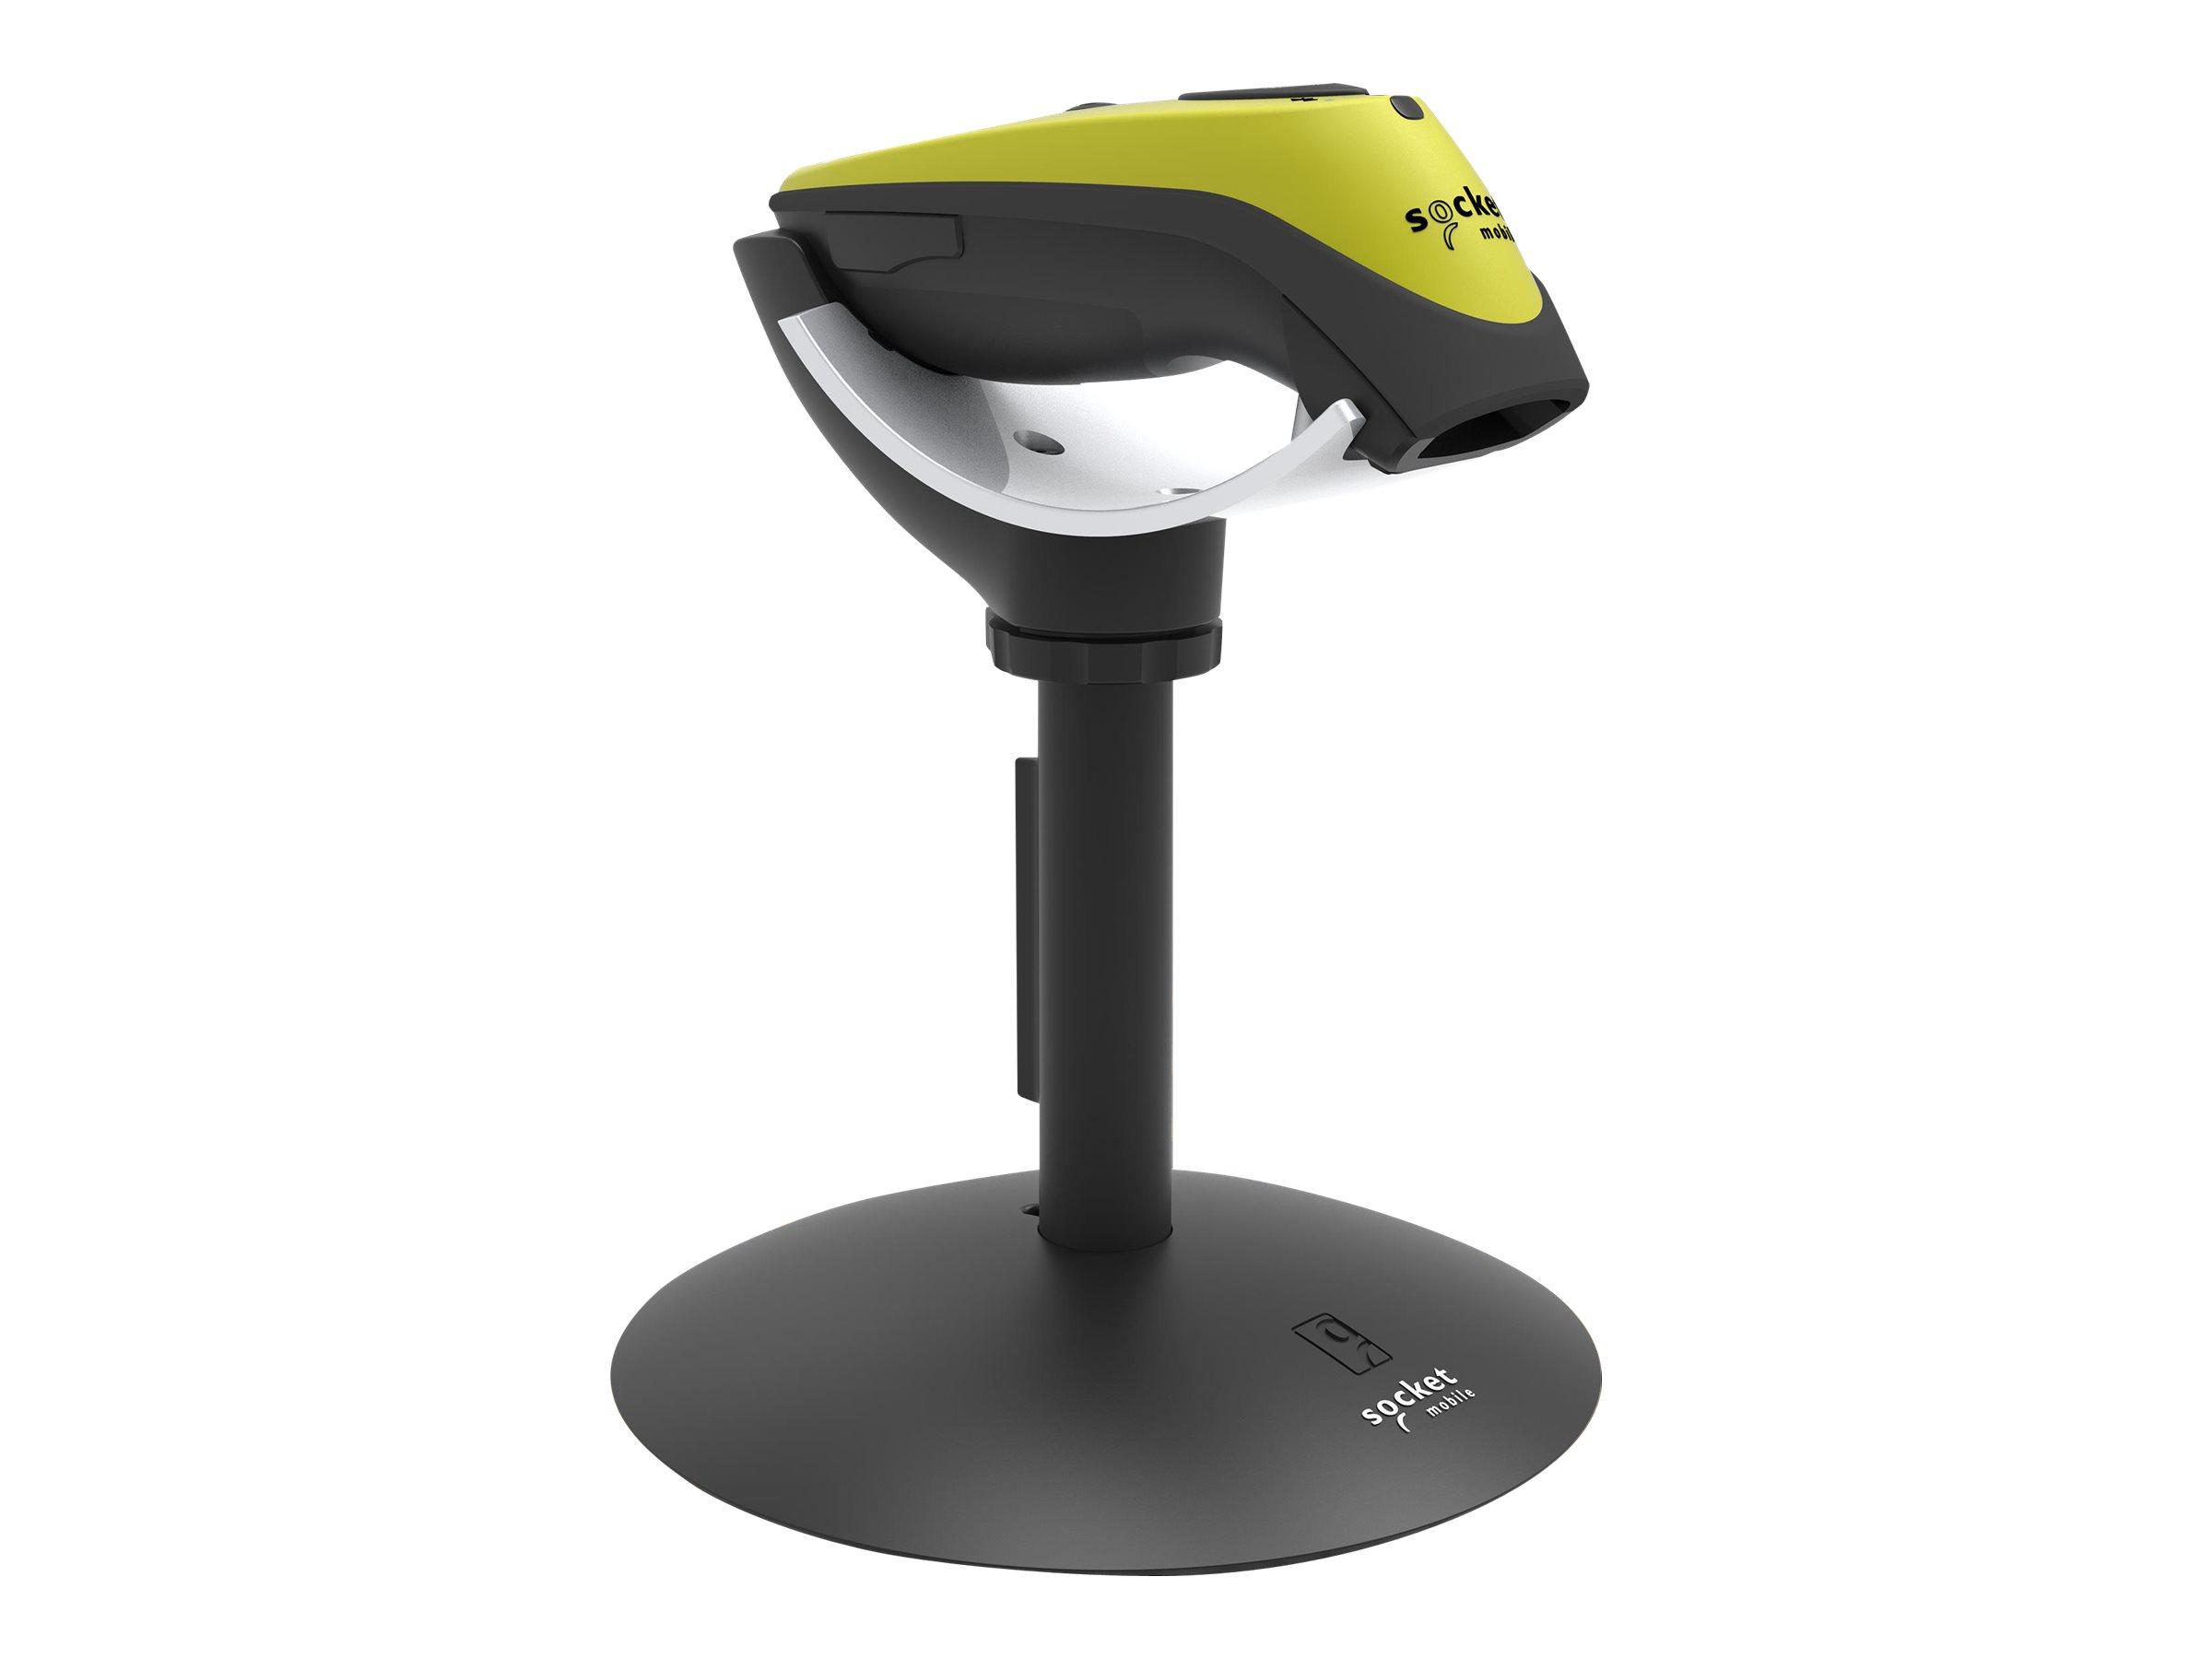 DuraScan D760 - Mit Ladestation - Barcode-Scanner - tragbar - 2D-Imager - decodiert